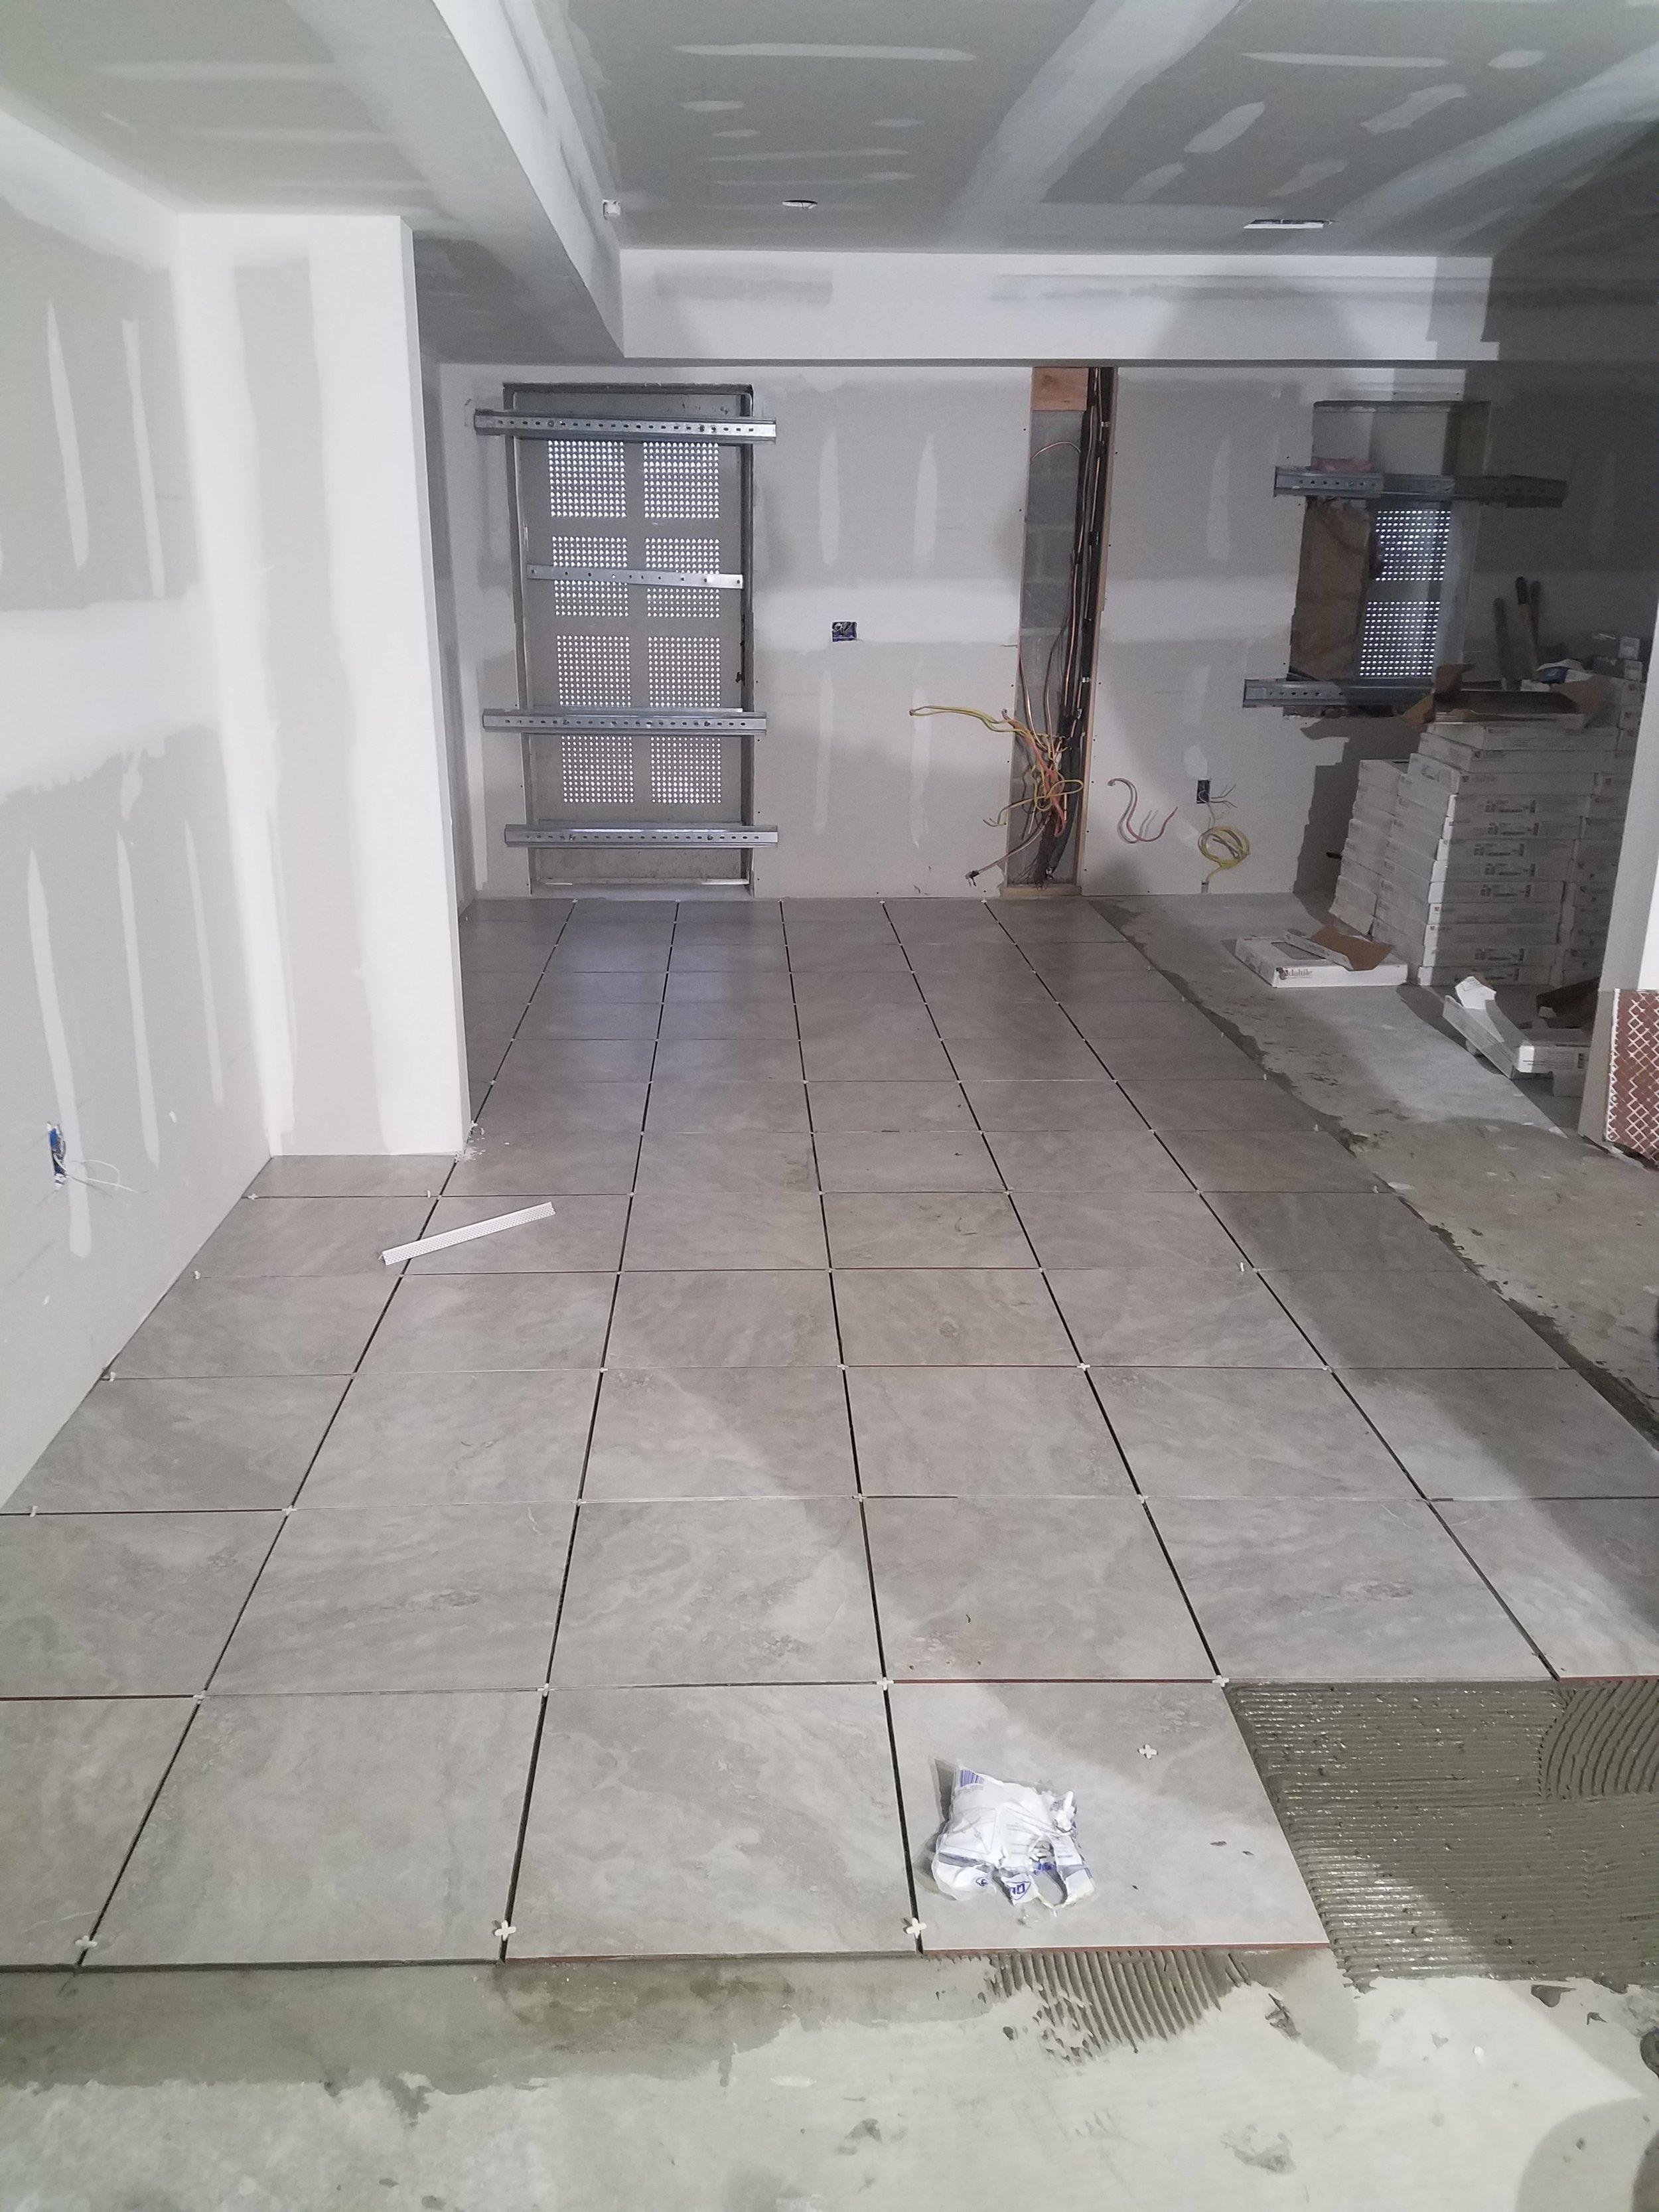 Ground Floor Tile